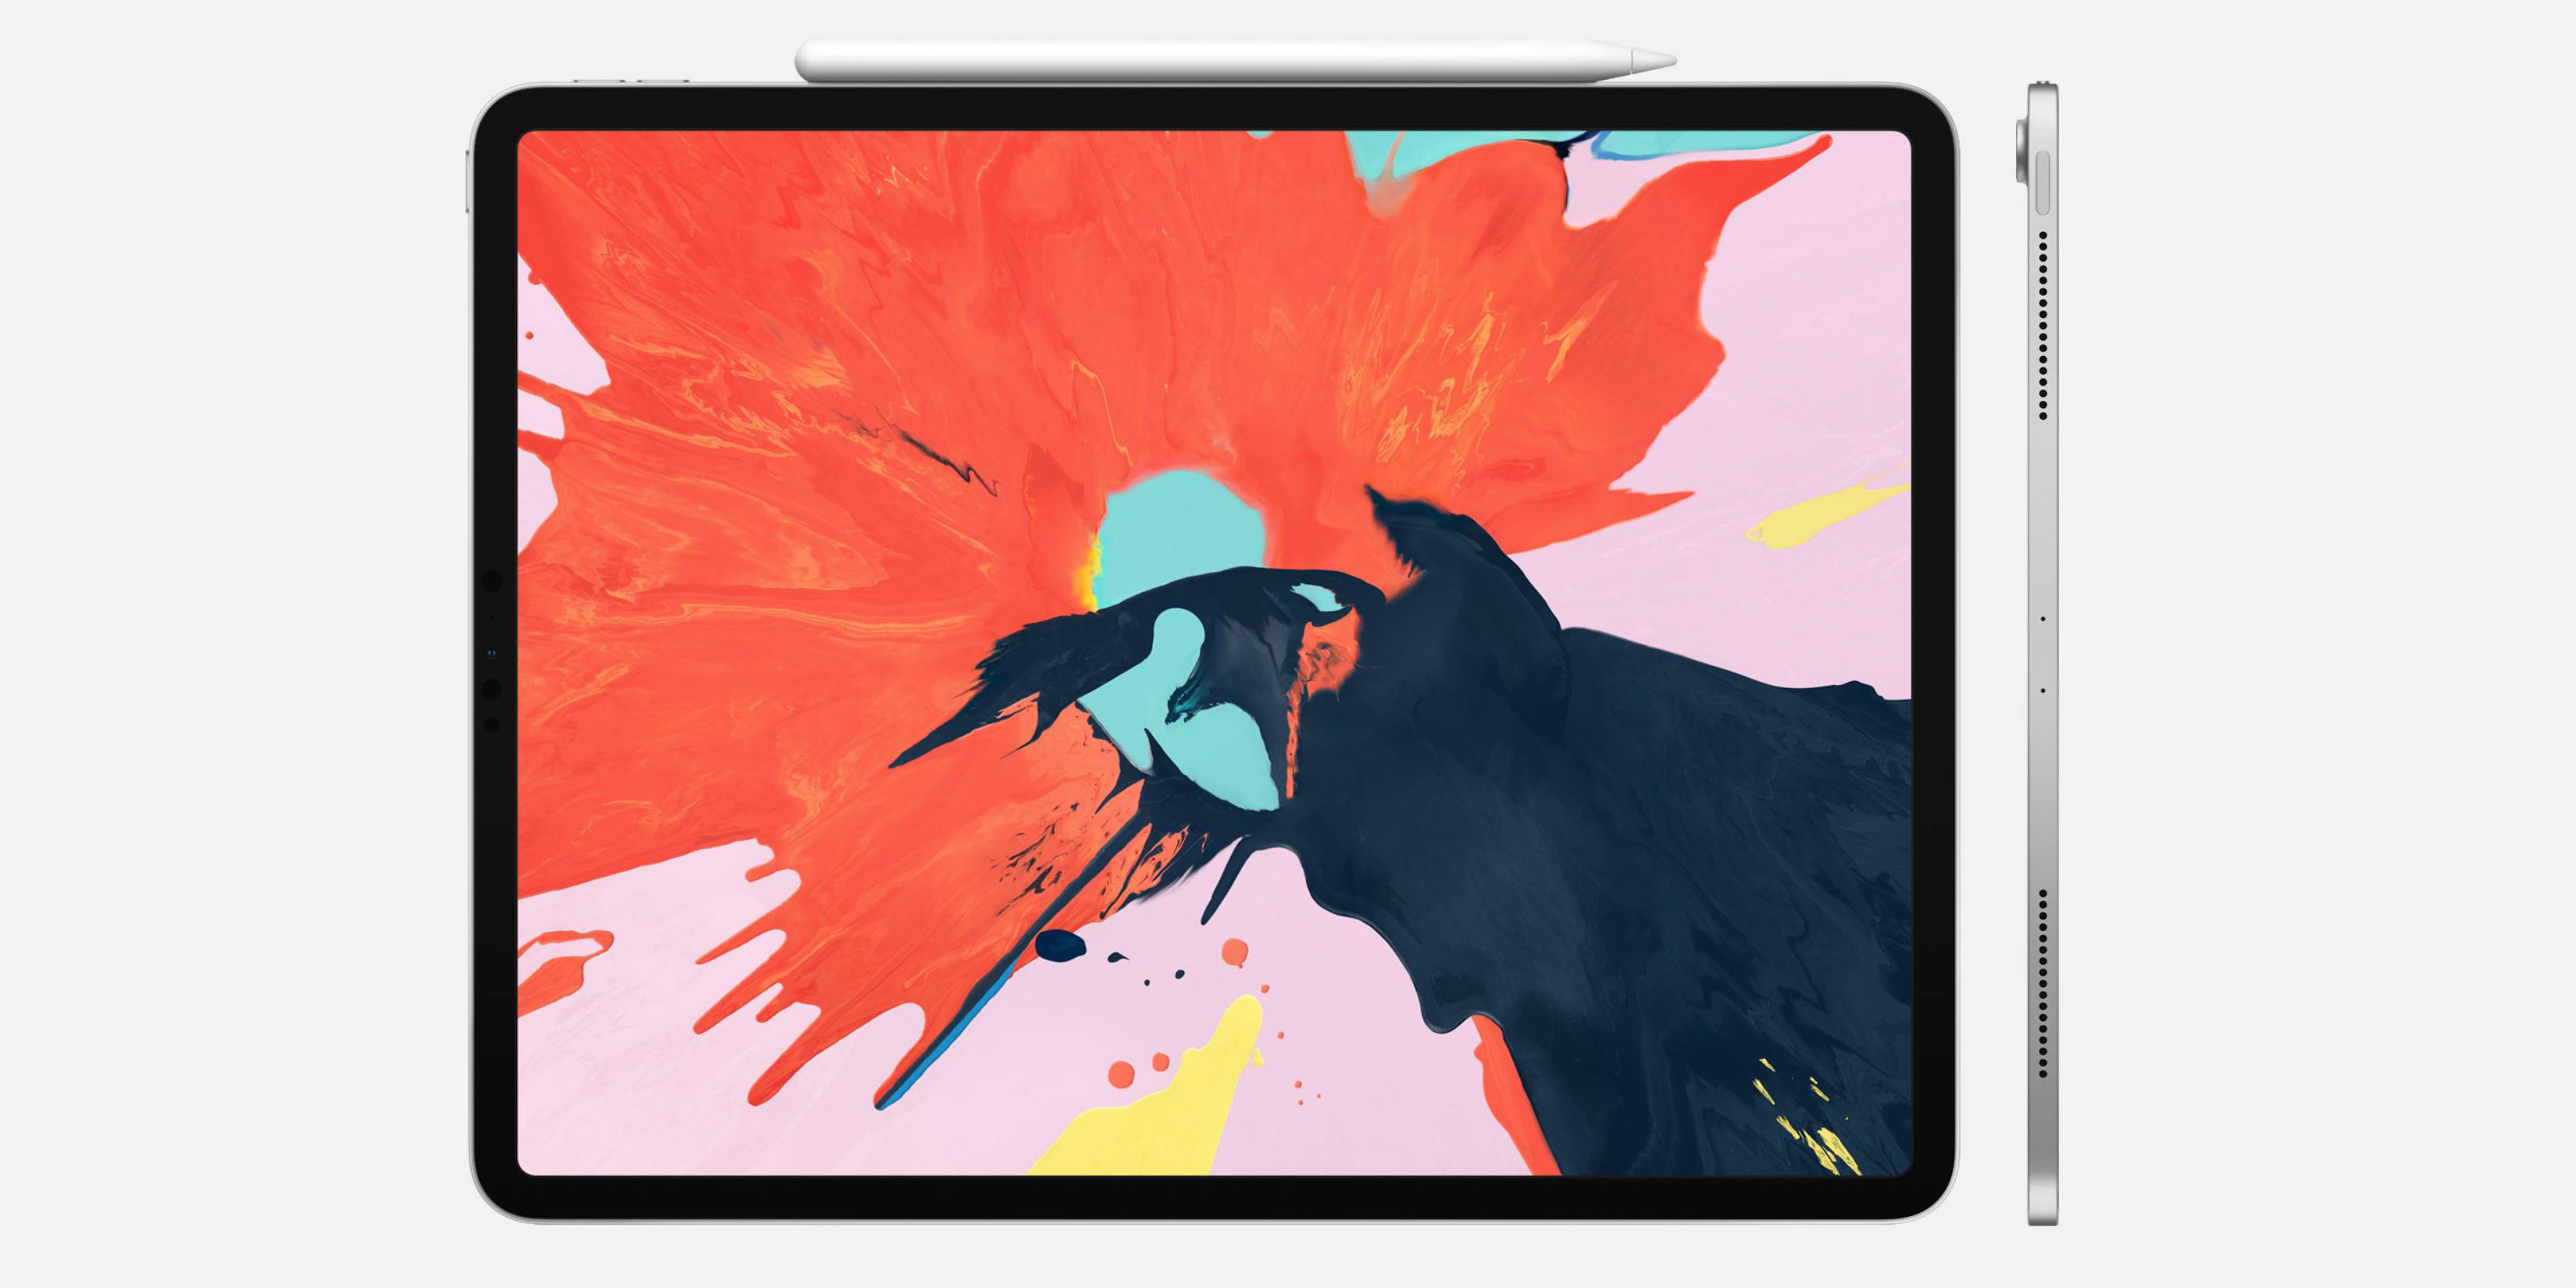 Amazon takes $100 off Apple's latest iPad Pros